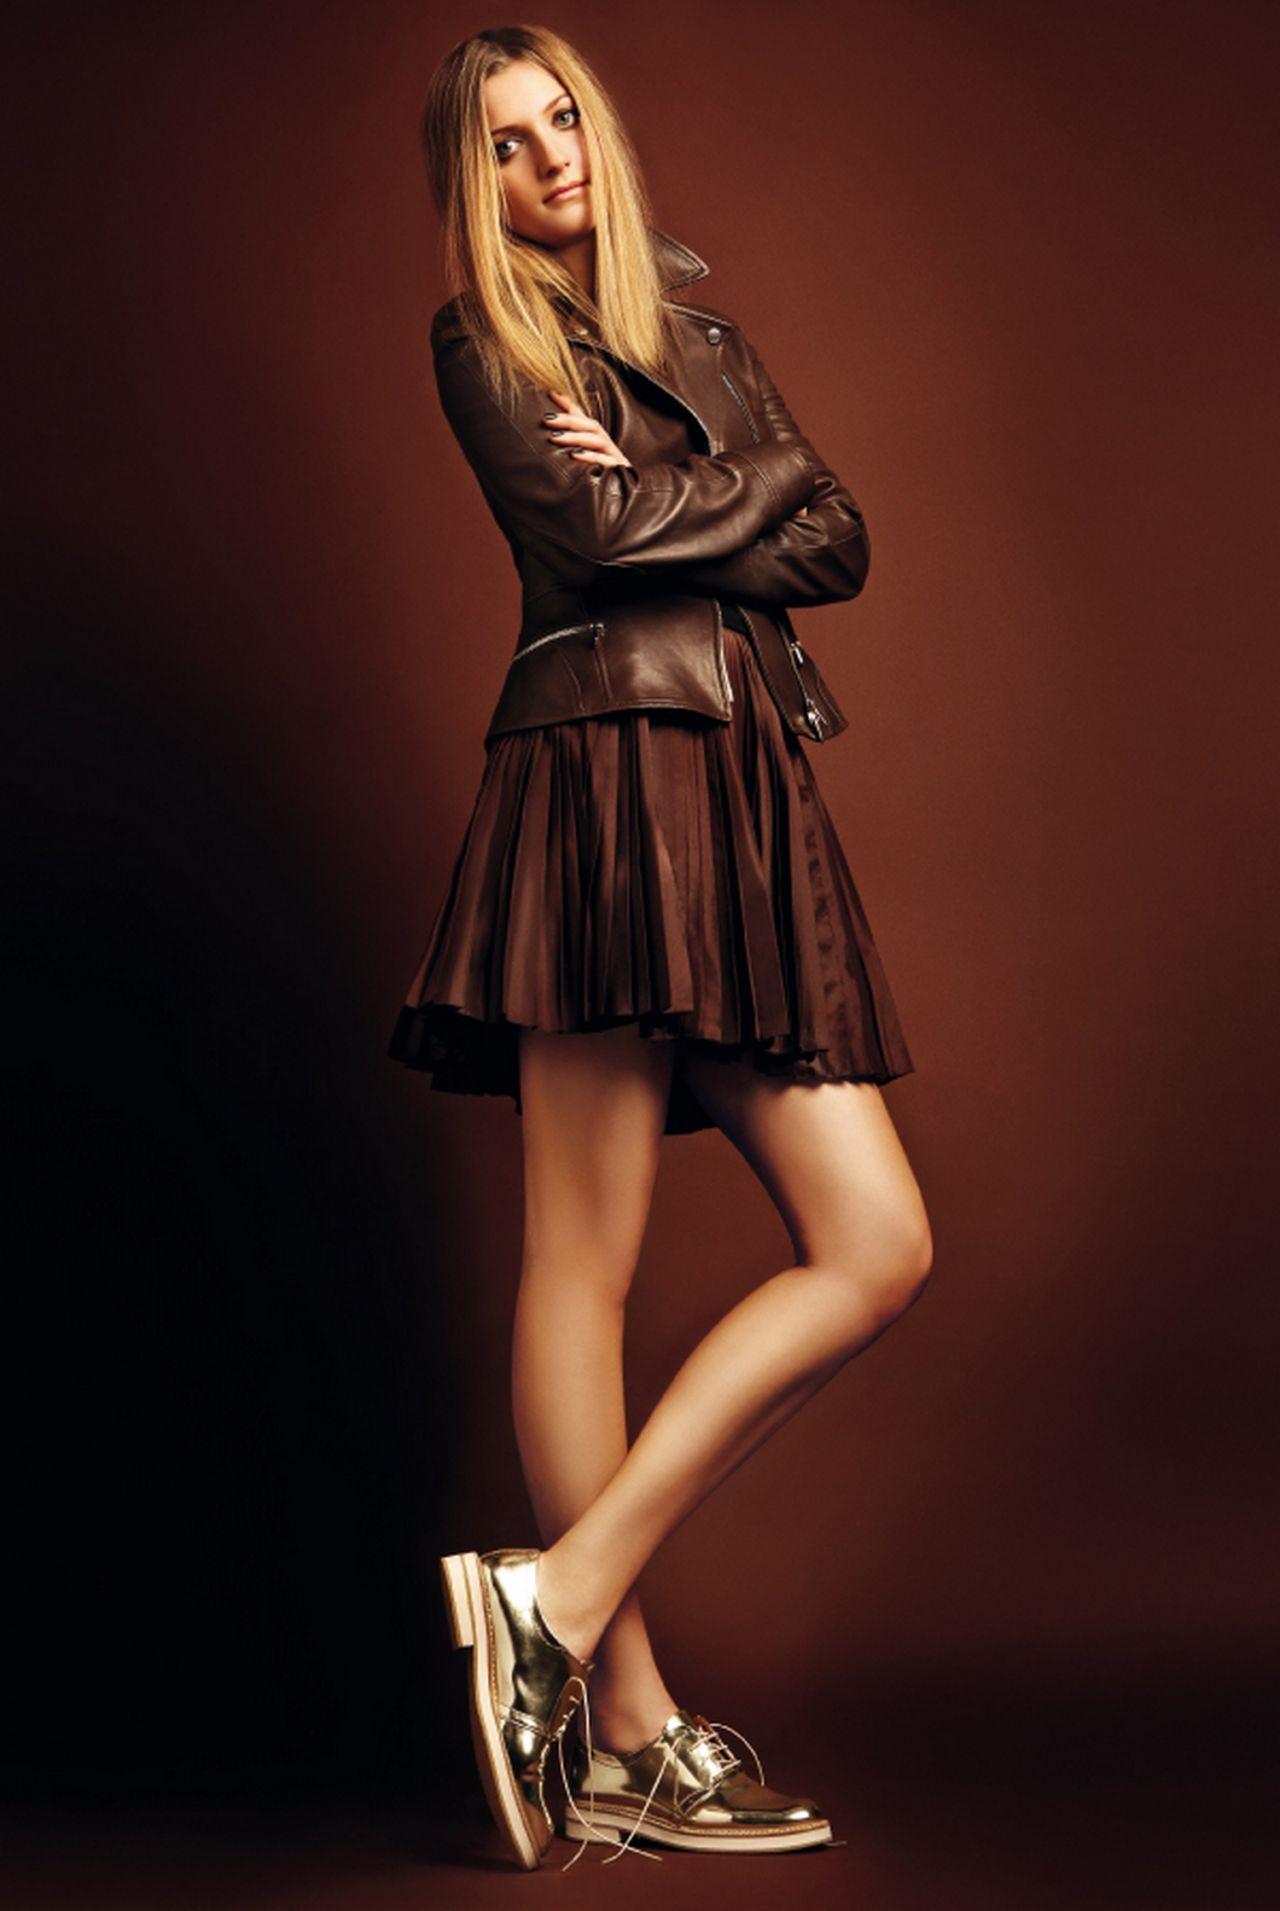 Petra Kvitova Photoshoot For Elle Magazine 2014